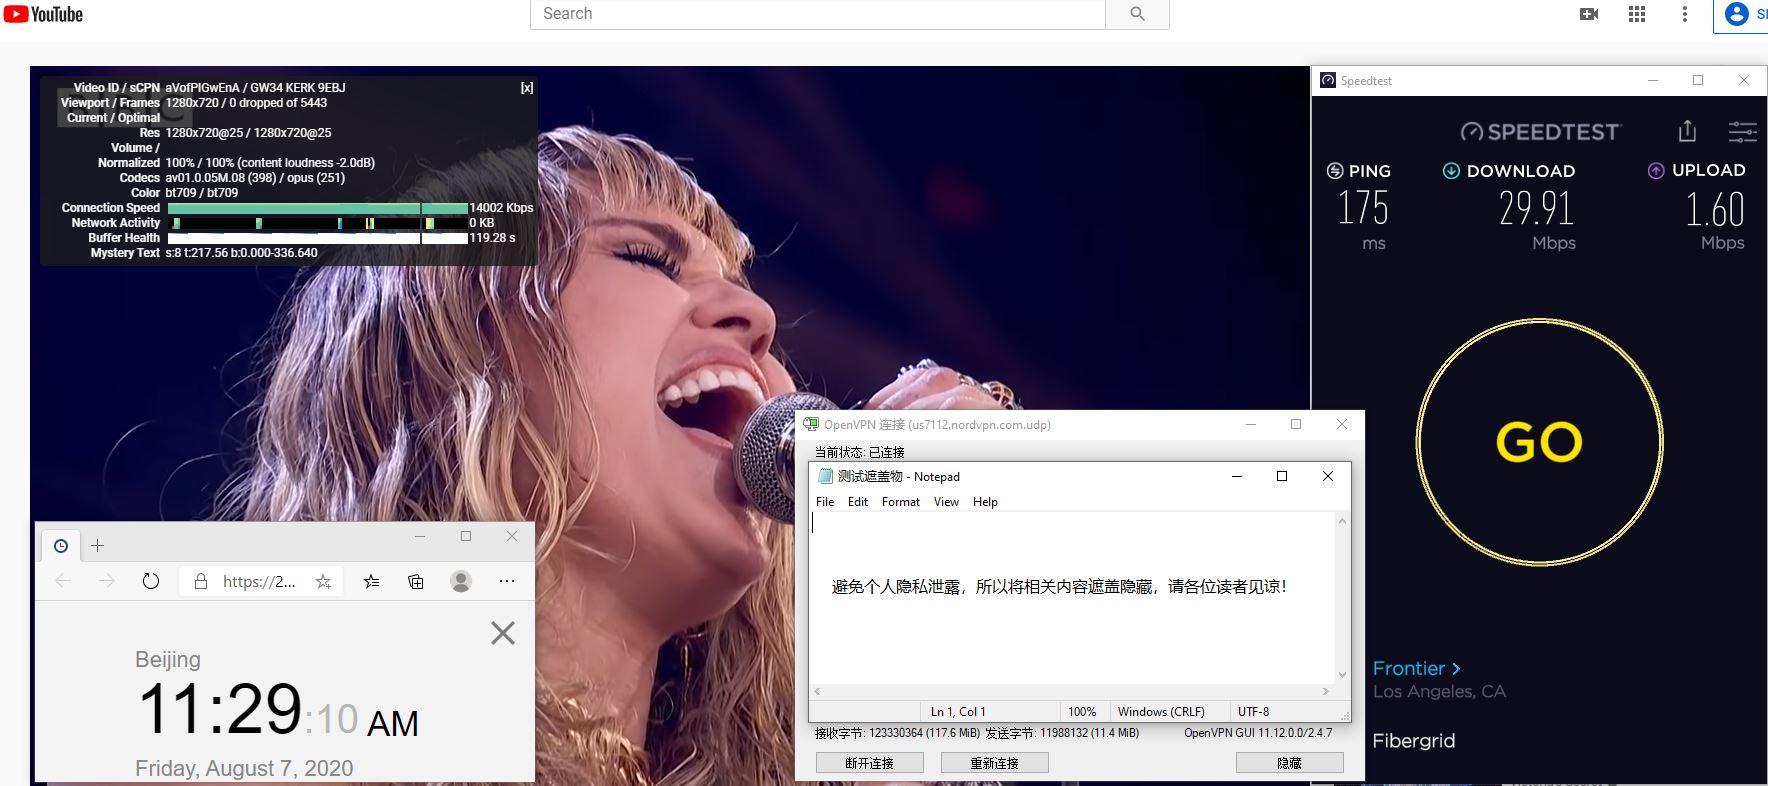 Windows10 NordVPN Open VPN GUI us7112 中国VPN 翻墙 科学上网 翻墙速度测试 - 20200807